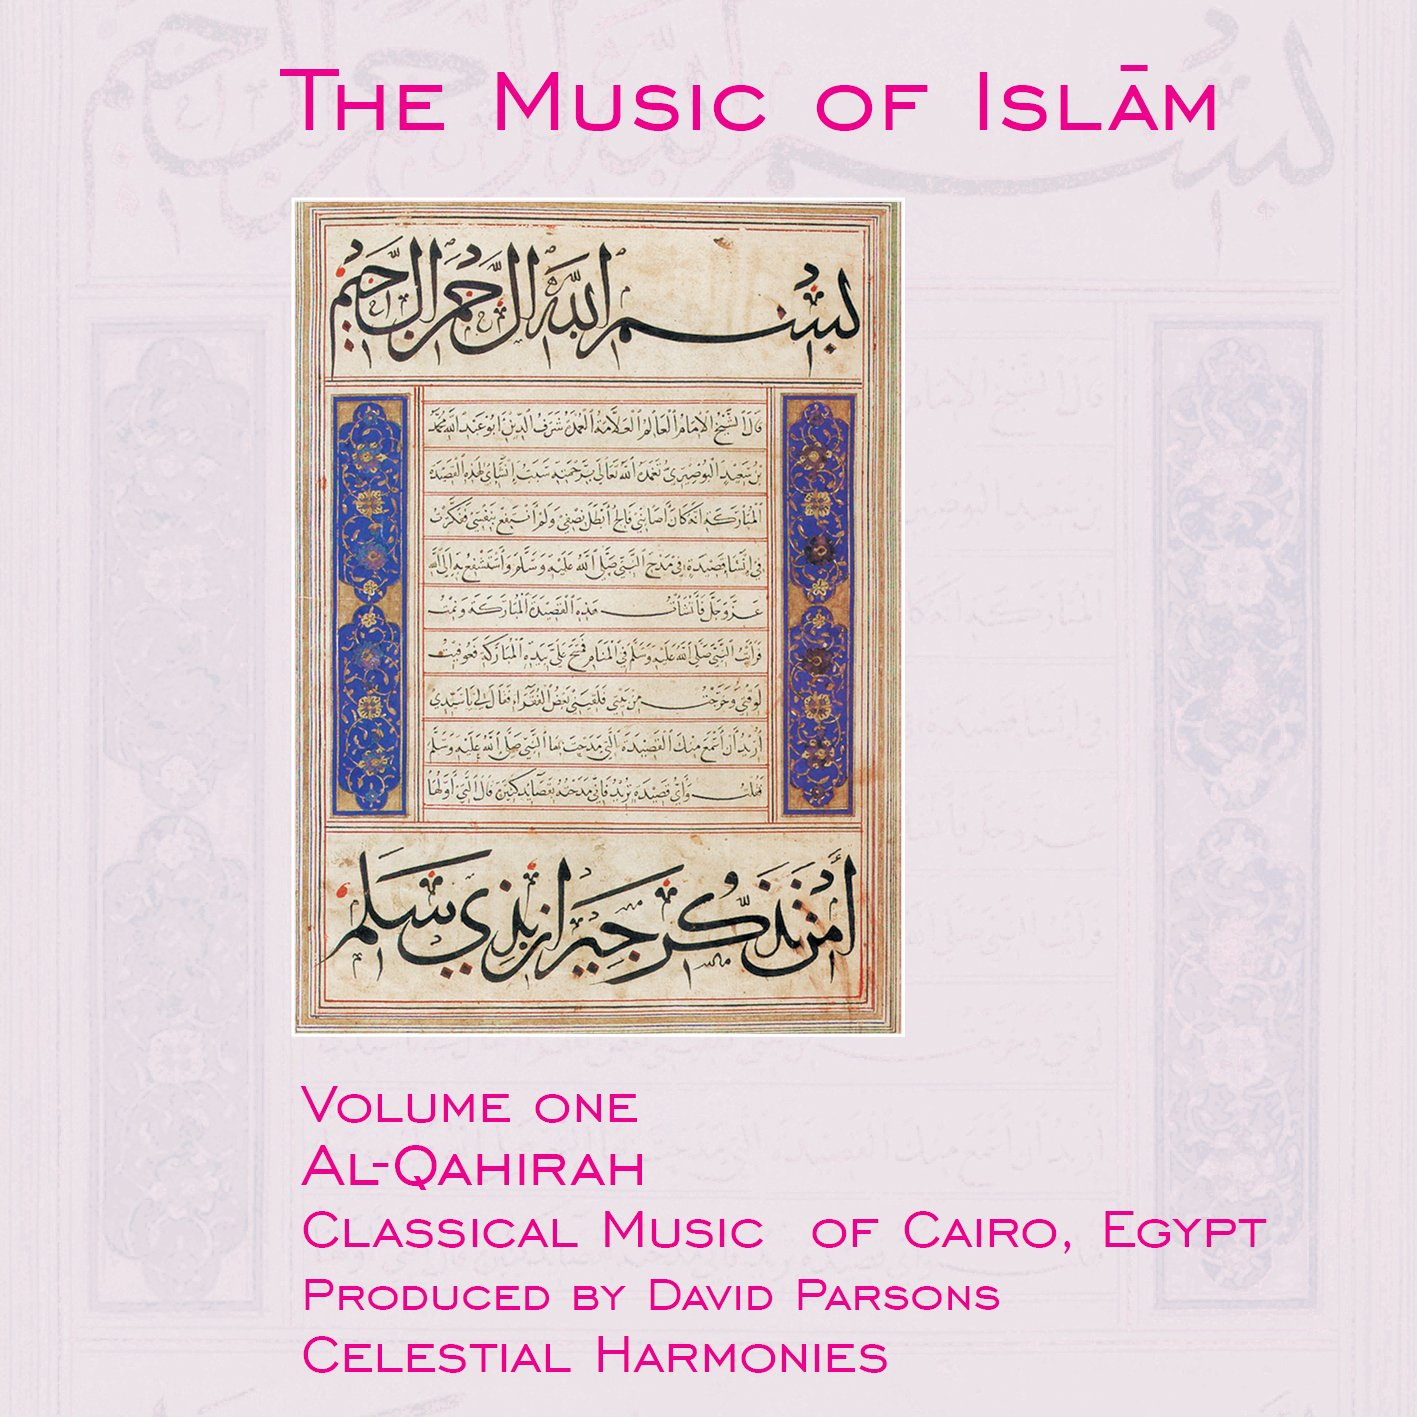 The Music of Islam, Vol. 1: Al-Qahirah, Classical Music of Cairo, Egypt